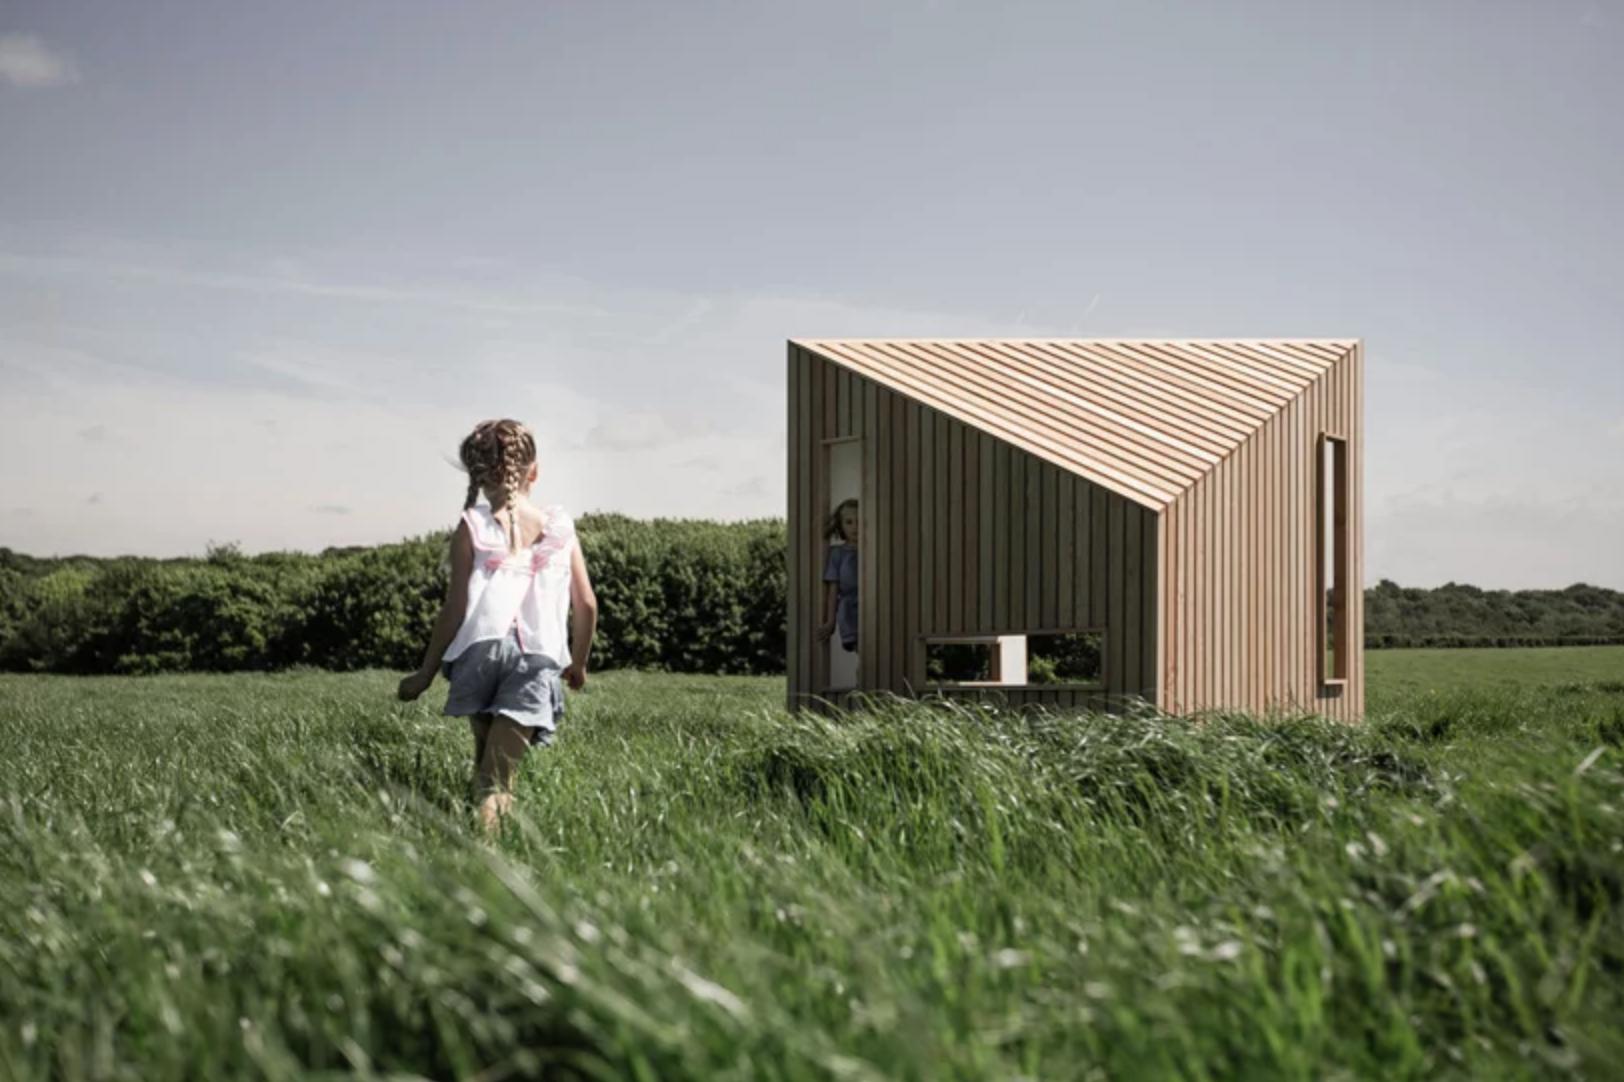 Child running to wooden cabin